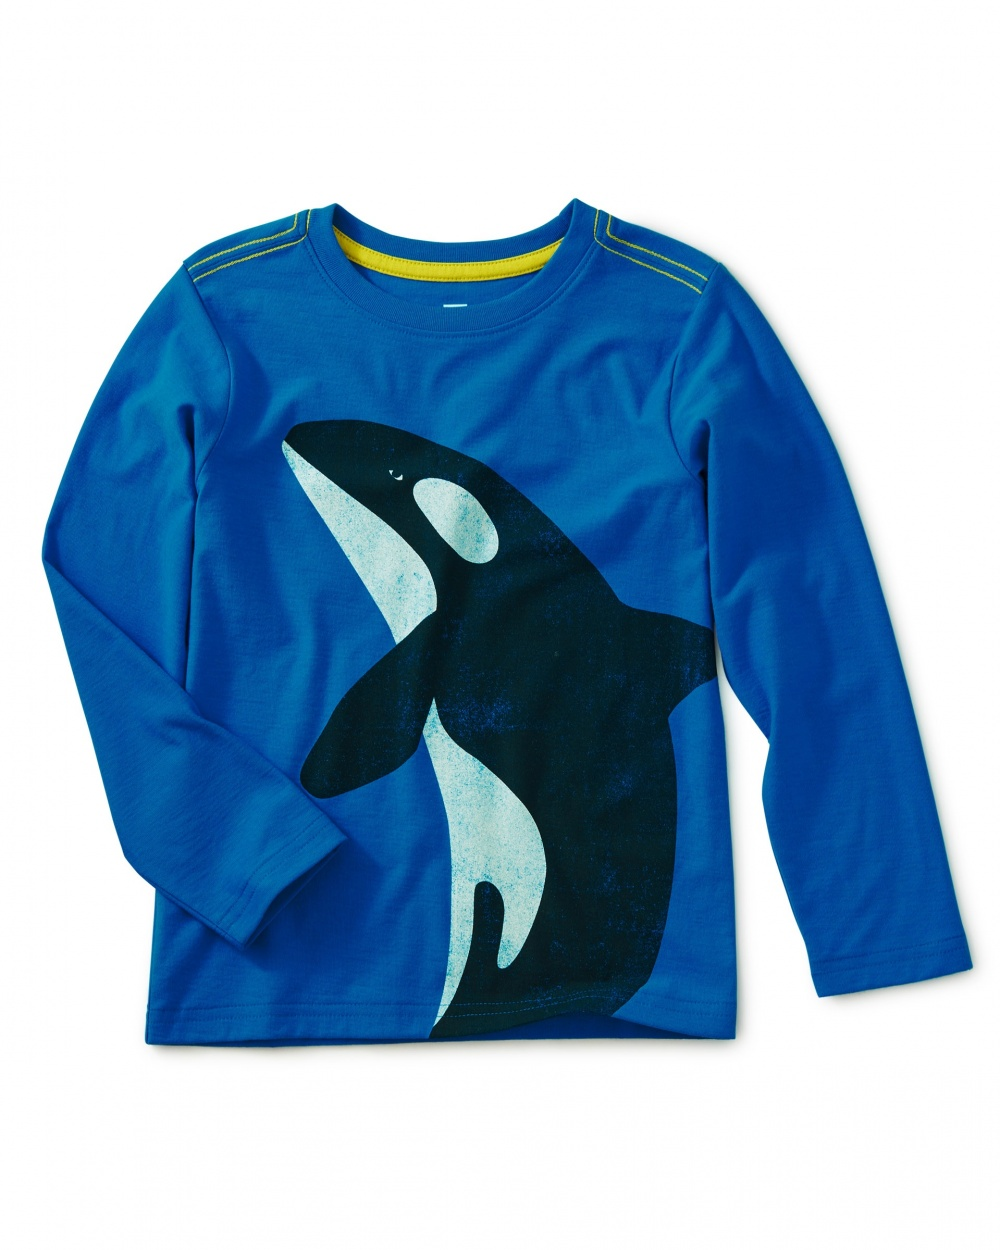 Orca Graphic Tee